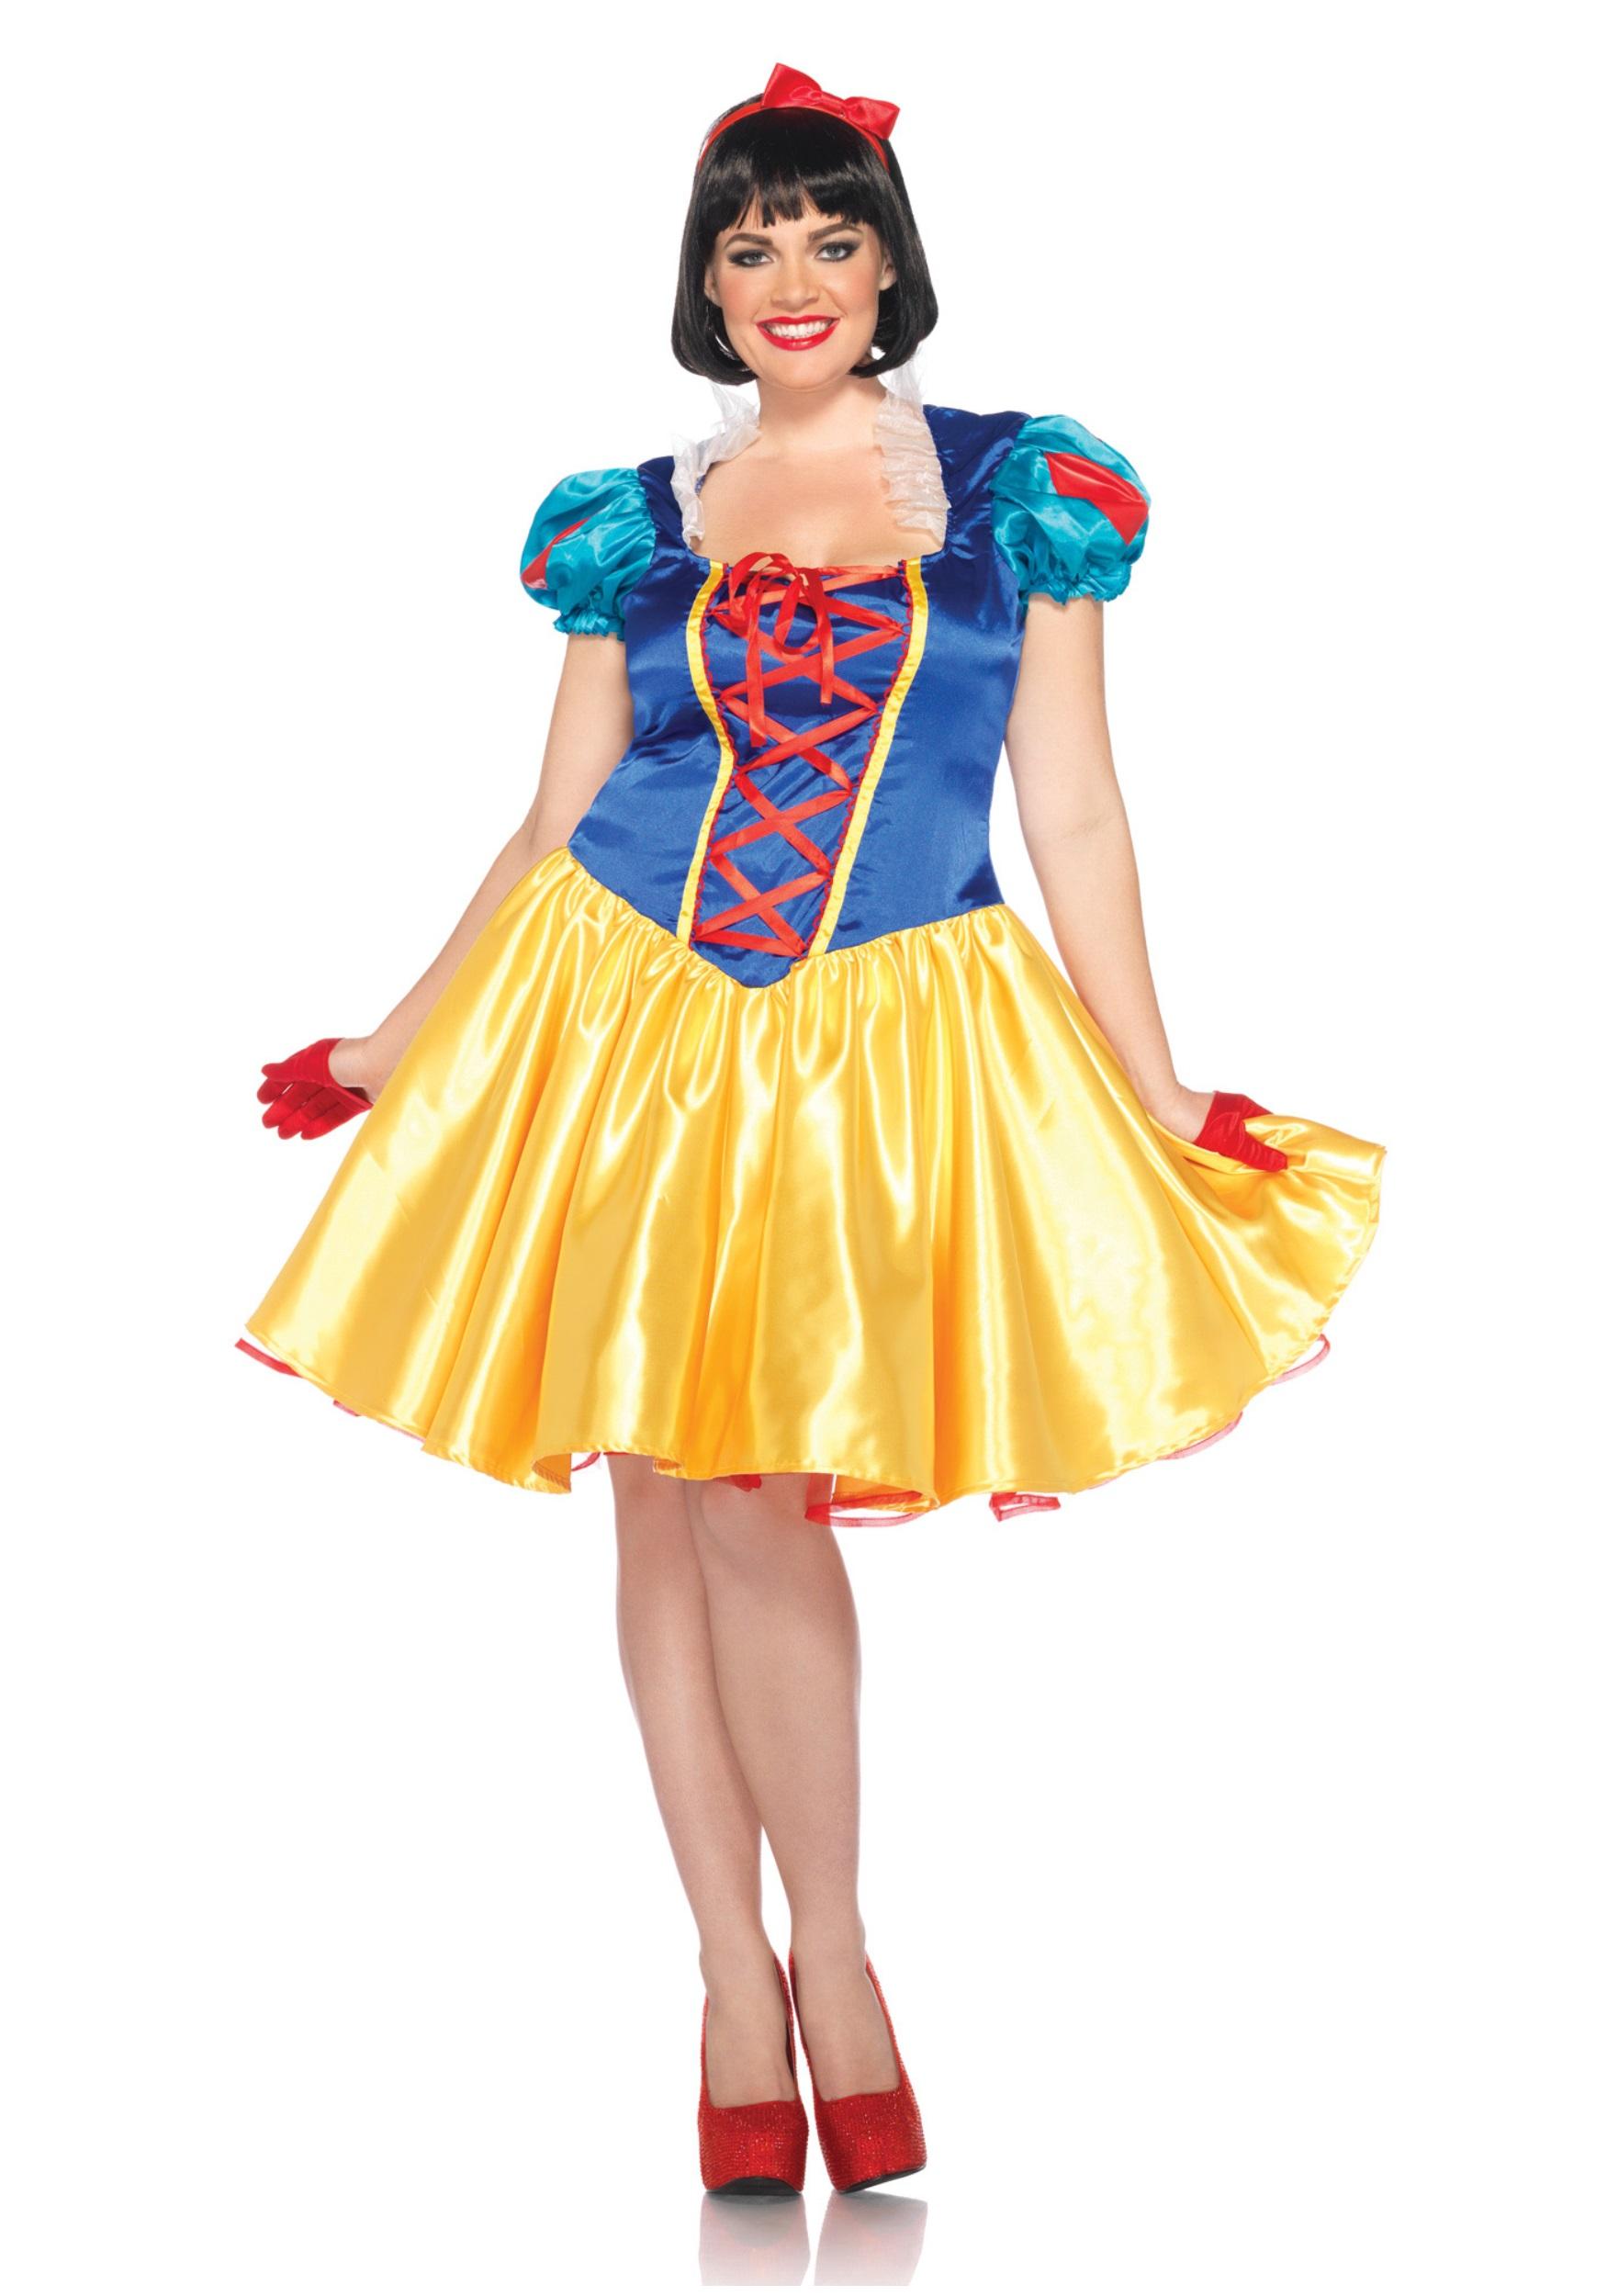 Disney Princess Costumes & Dresses - HalloweenCostumes.com